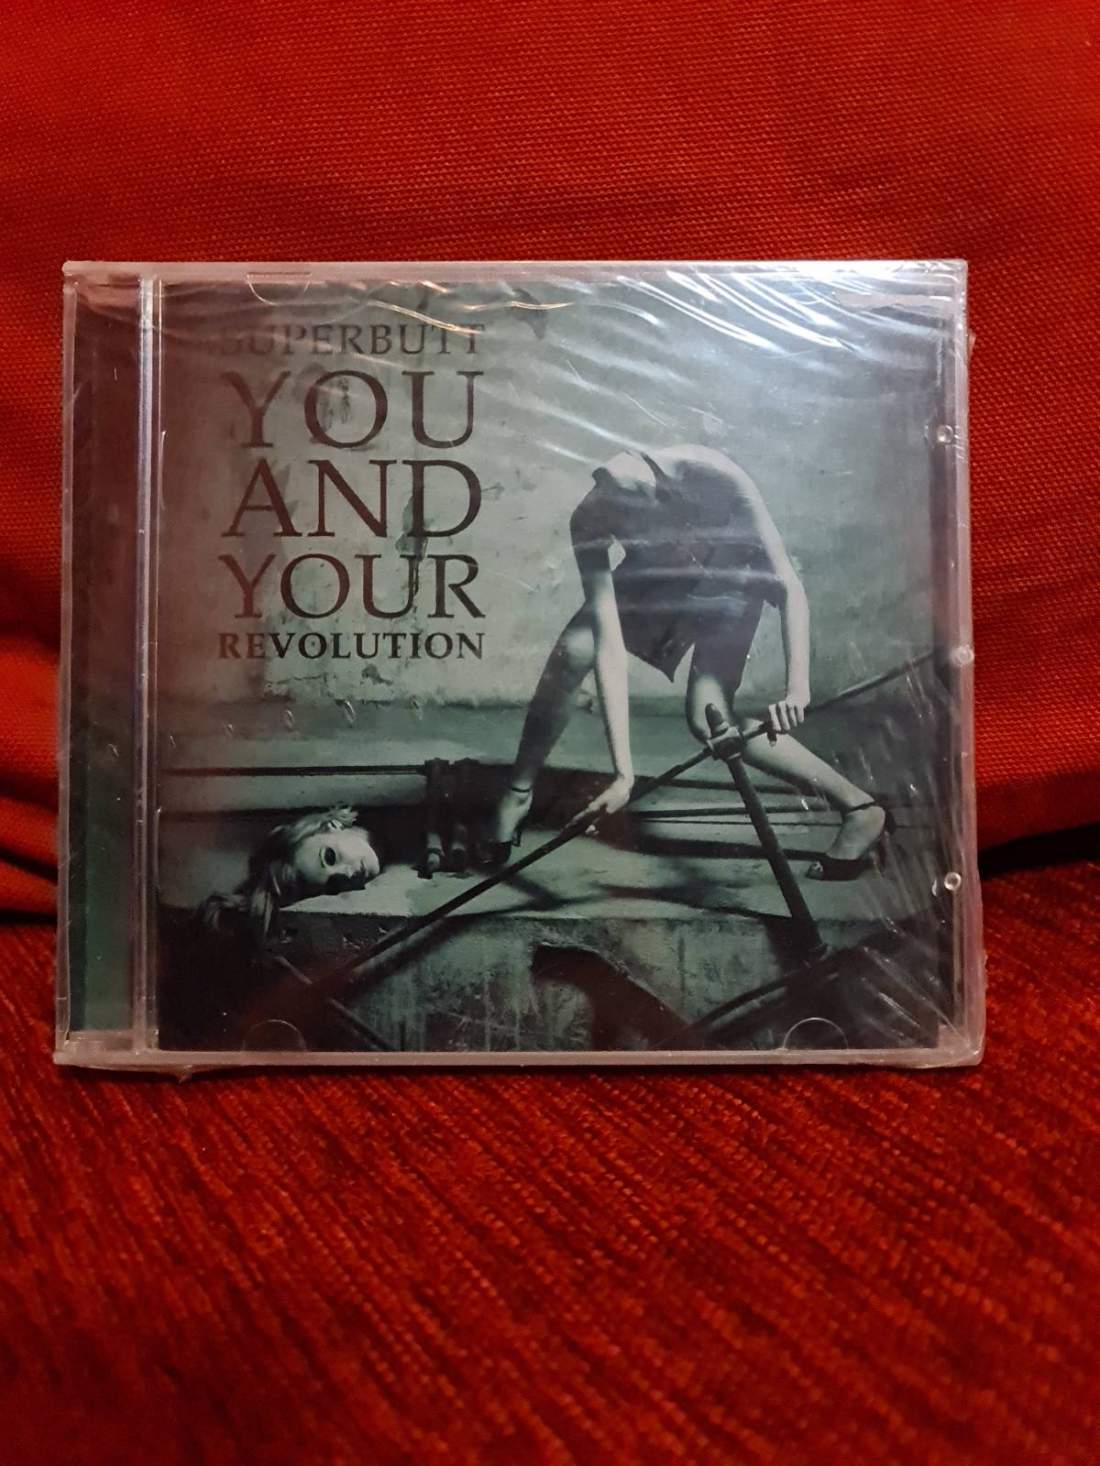 SUPERBUTT - YOU AND YOUR REVOLUTION CD